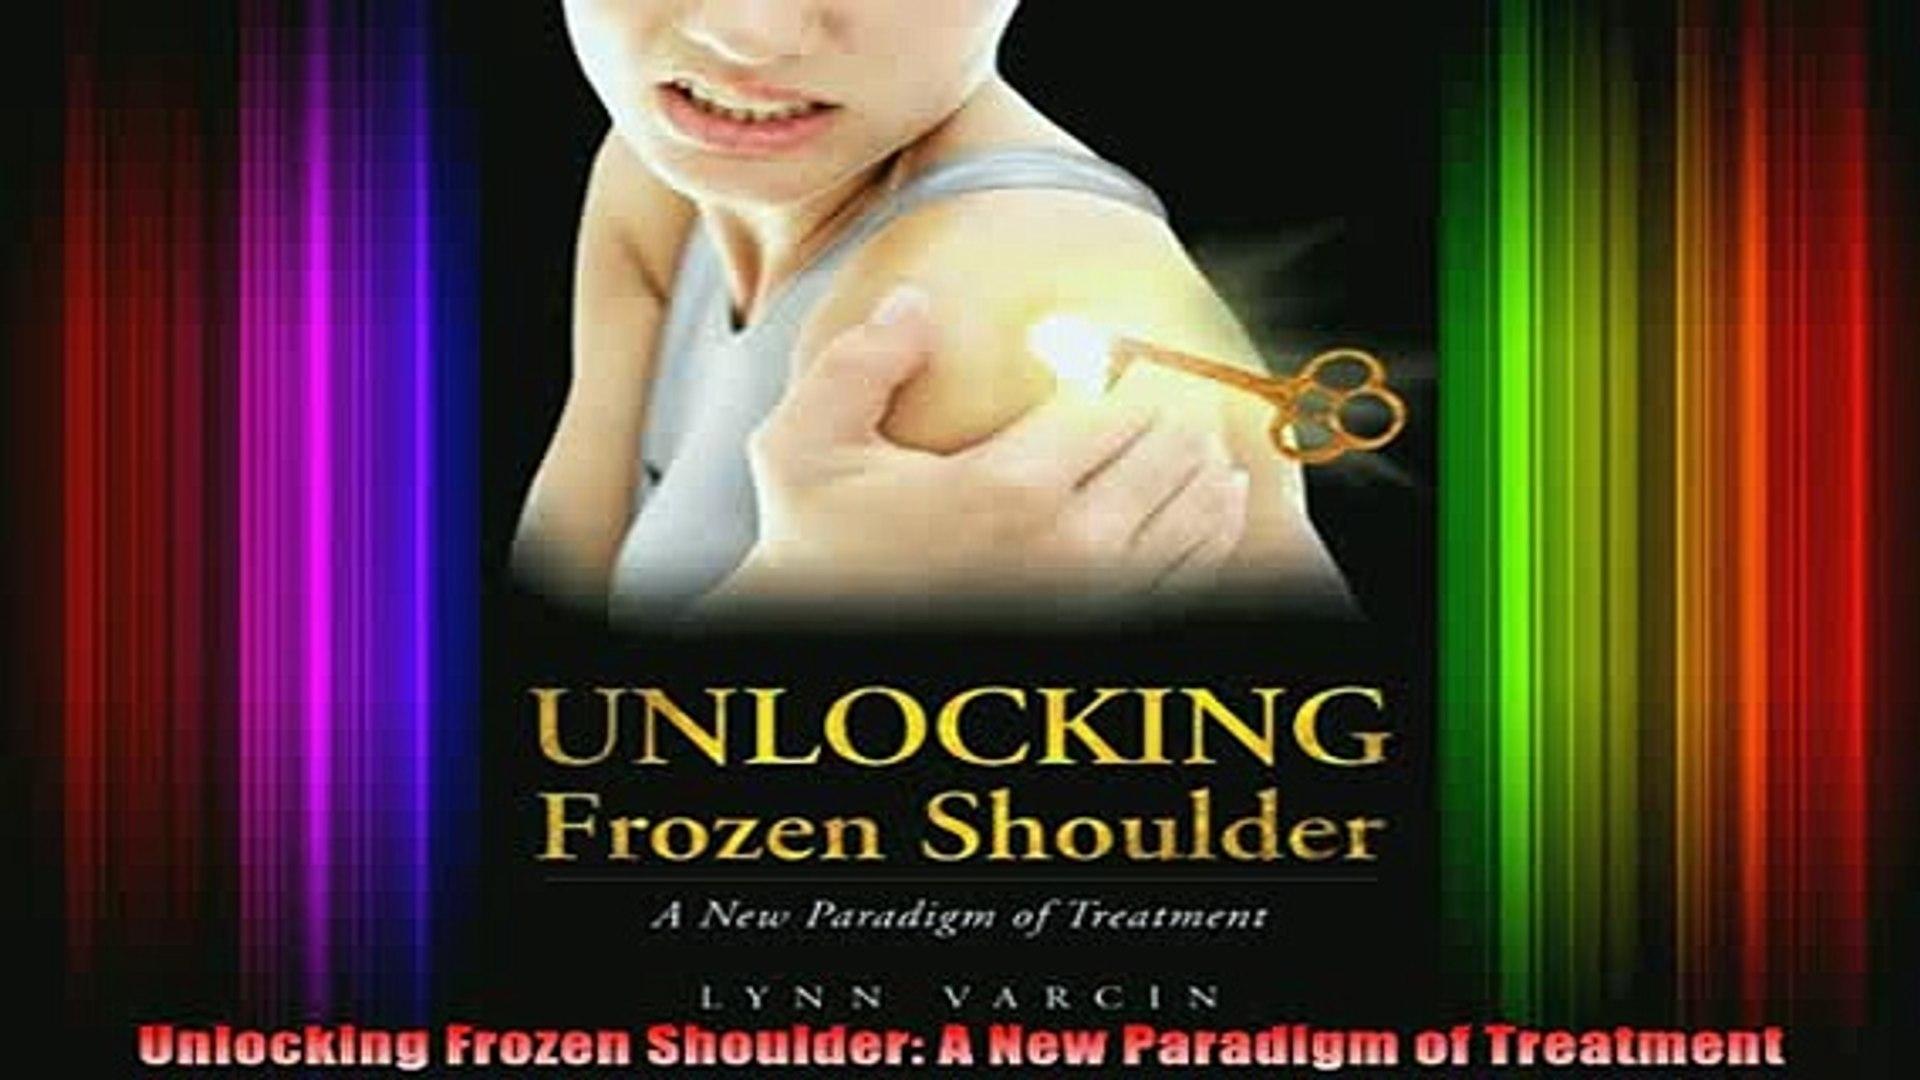 Unlocking Frozen Shoulder: A New Paradigm of Treatment